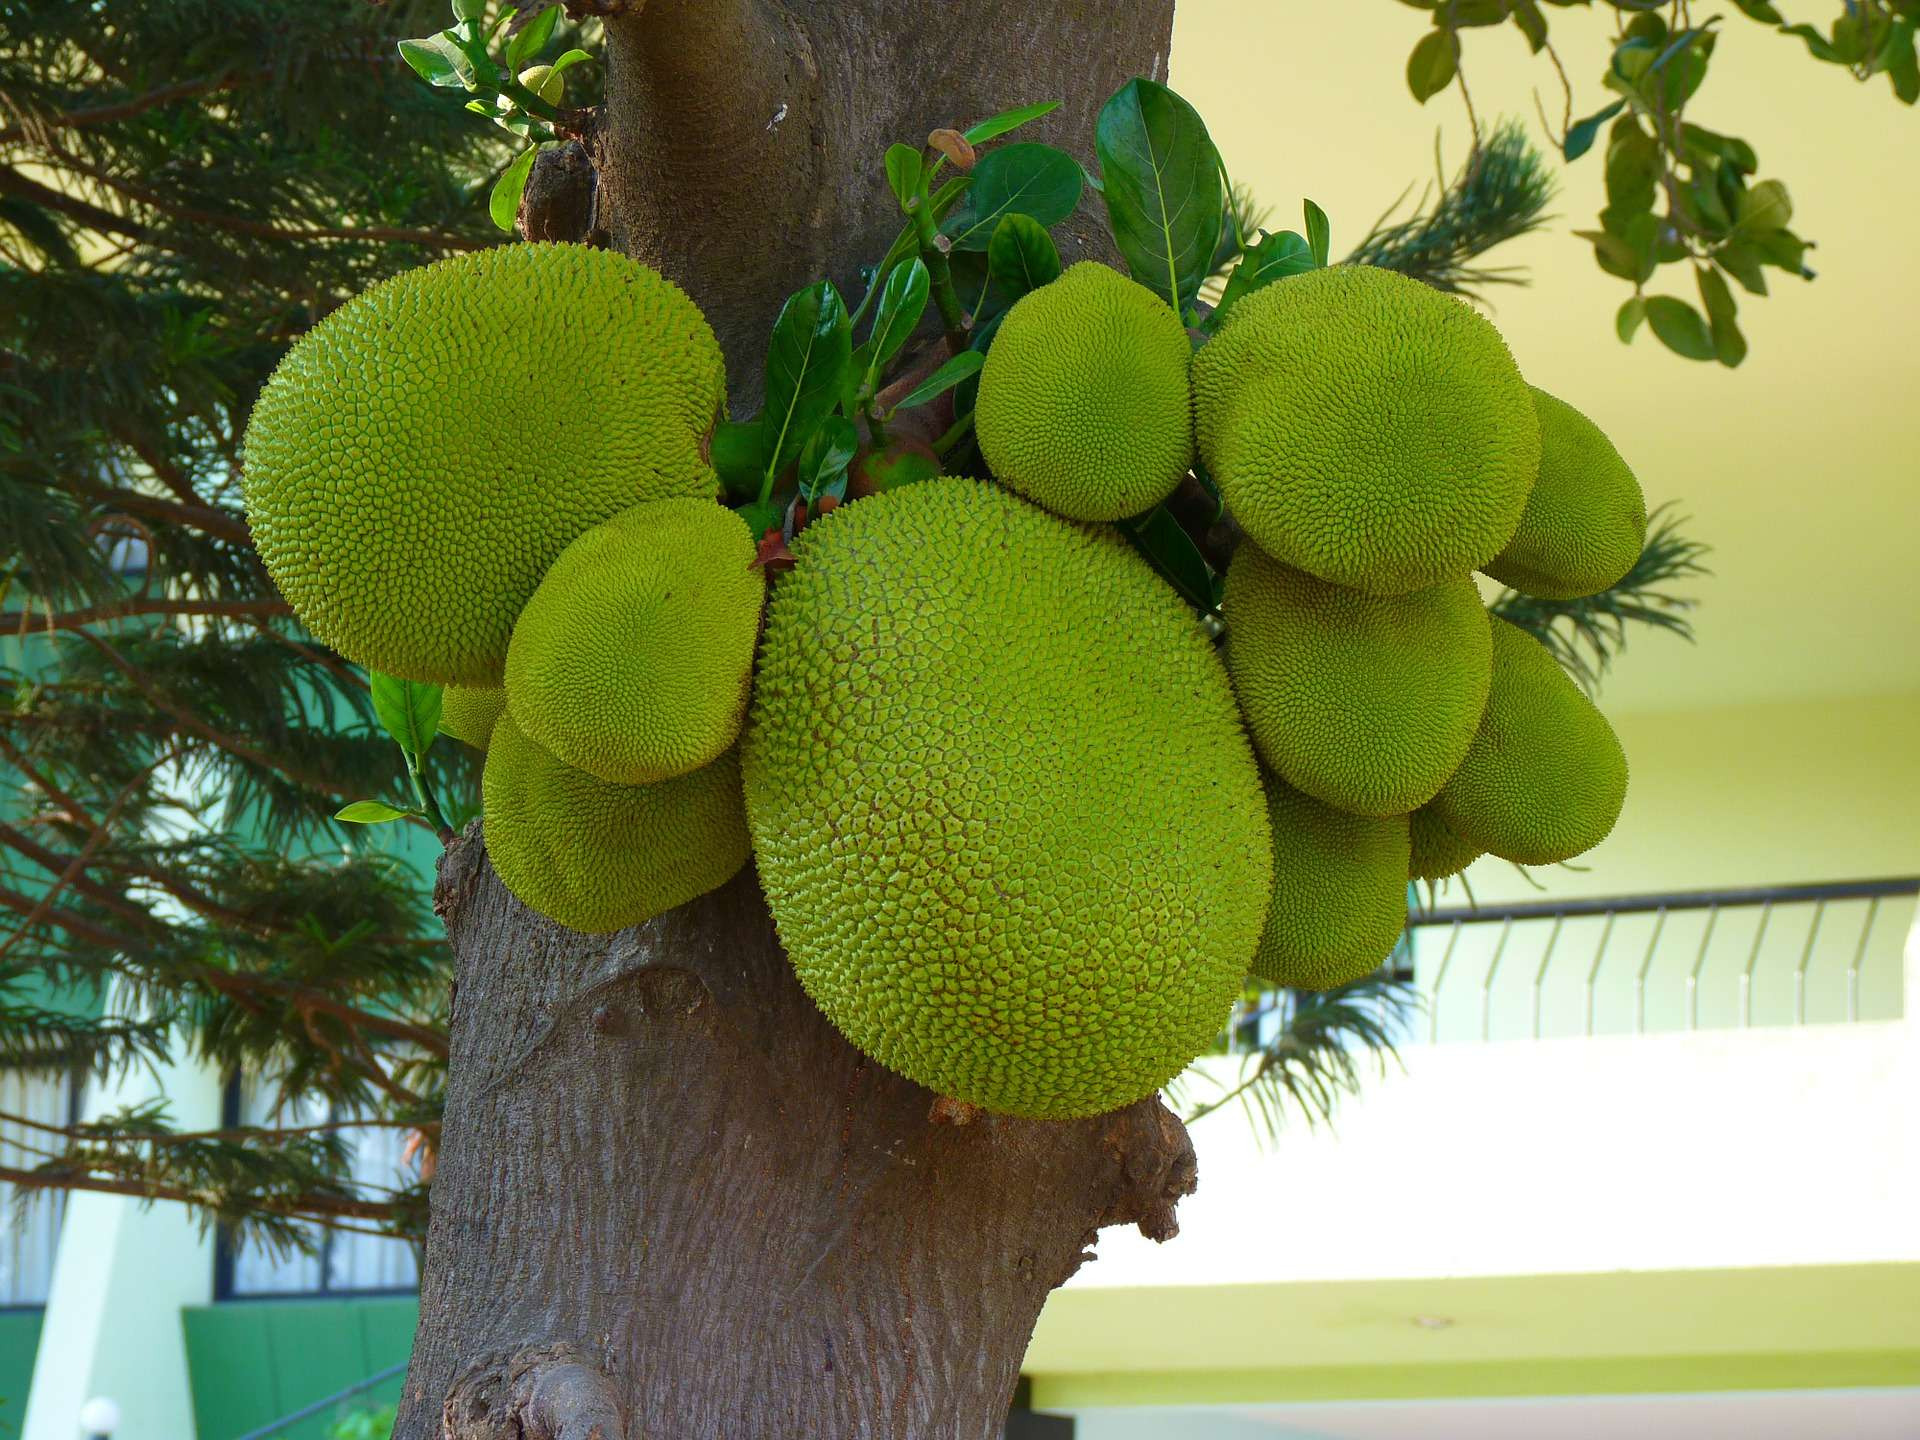 Jackfruit gesund